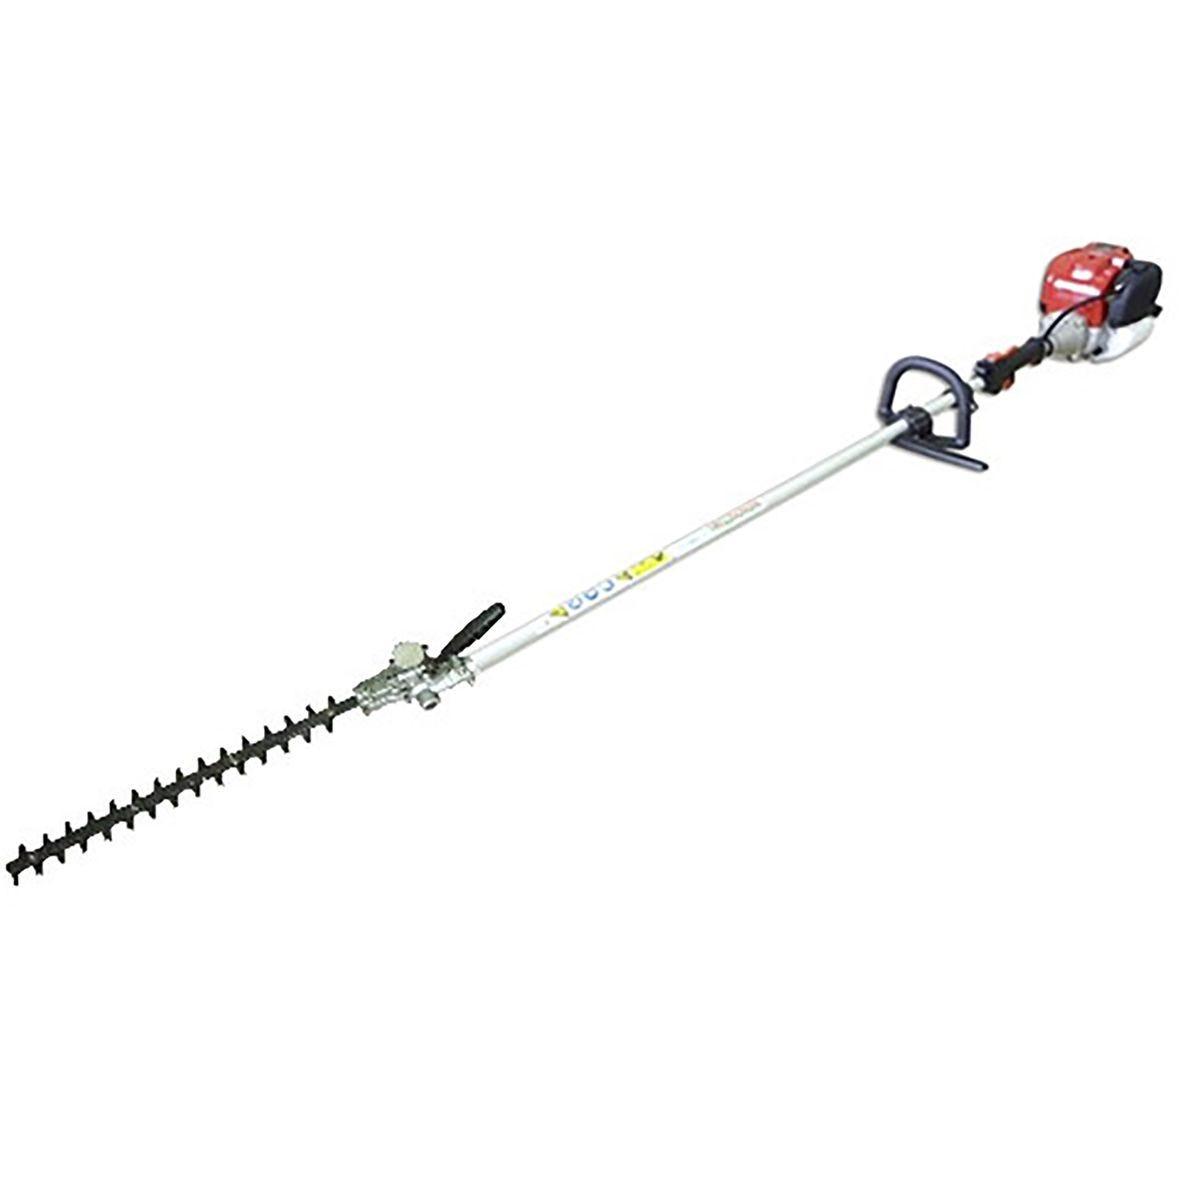 Webb 27cc Kawasaki Professional Petrol Long Reach Hedge Trimmer